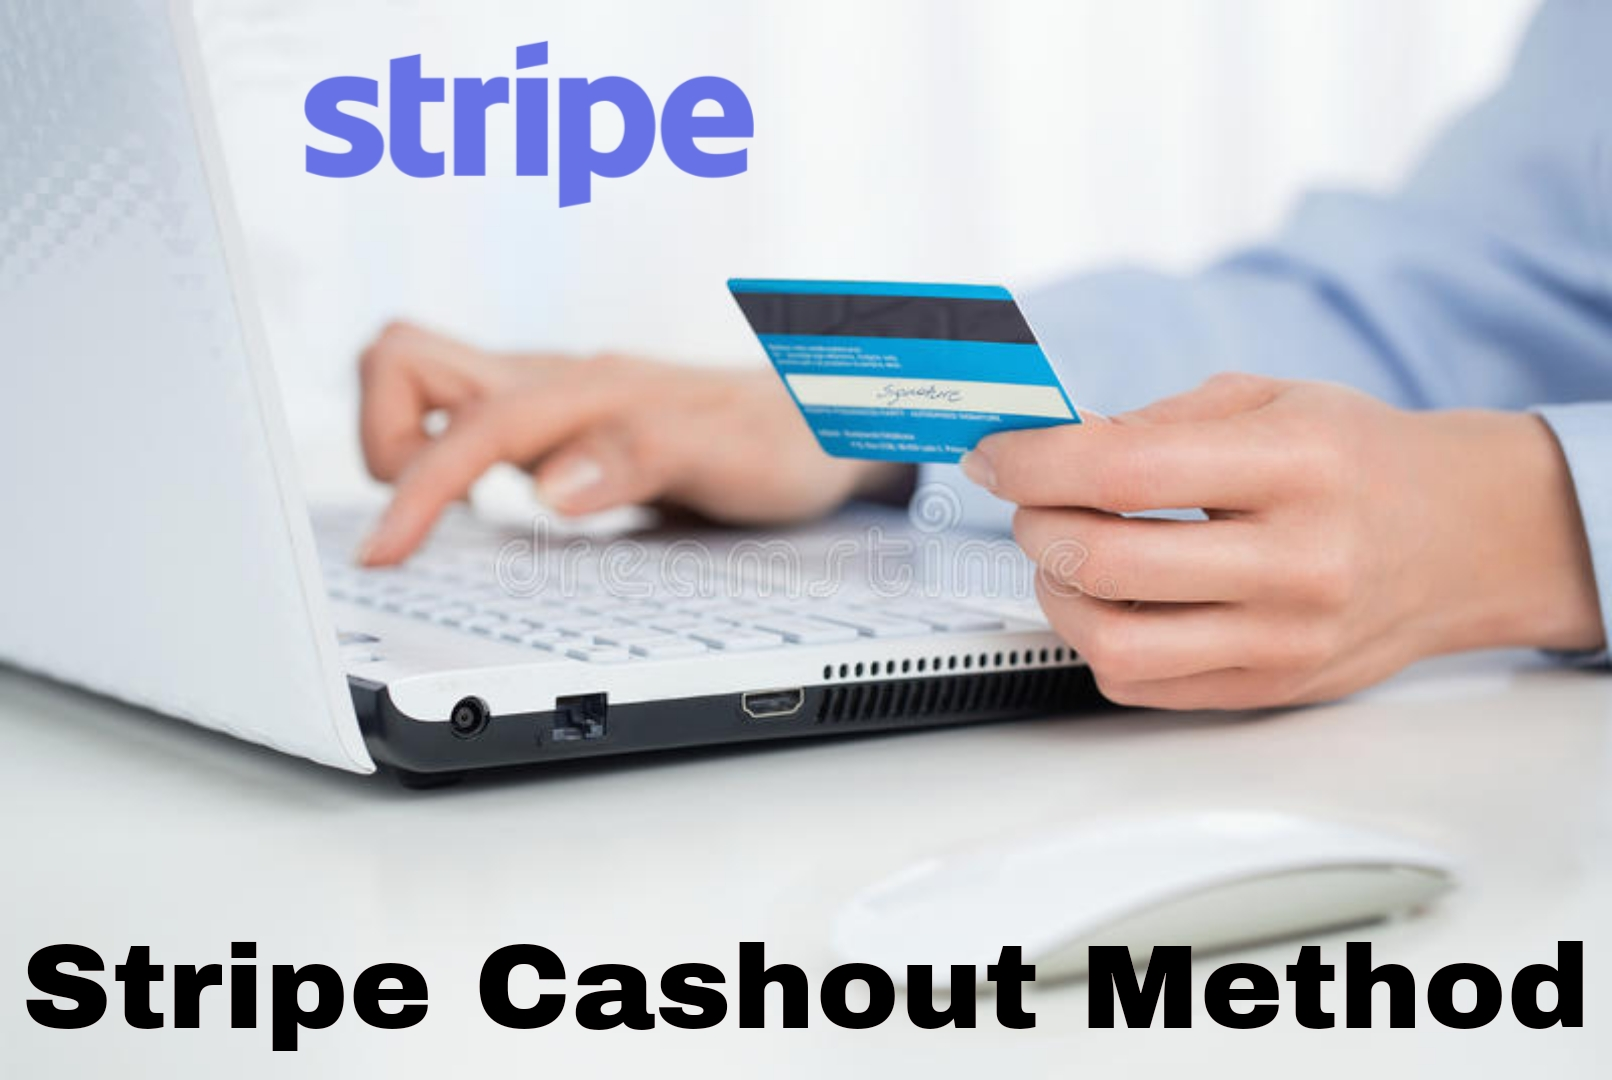 Stripe Cashout Method